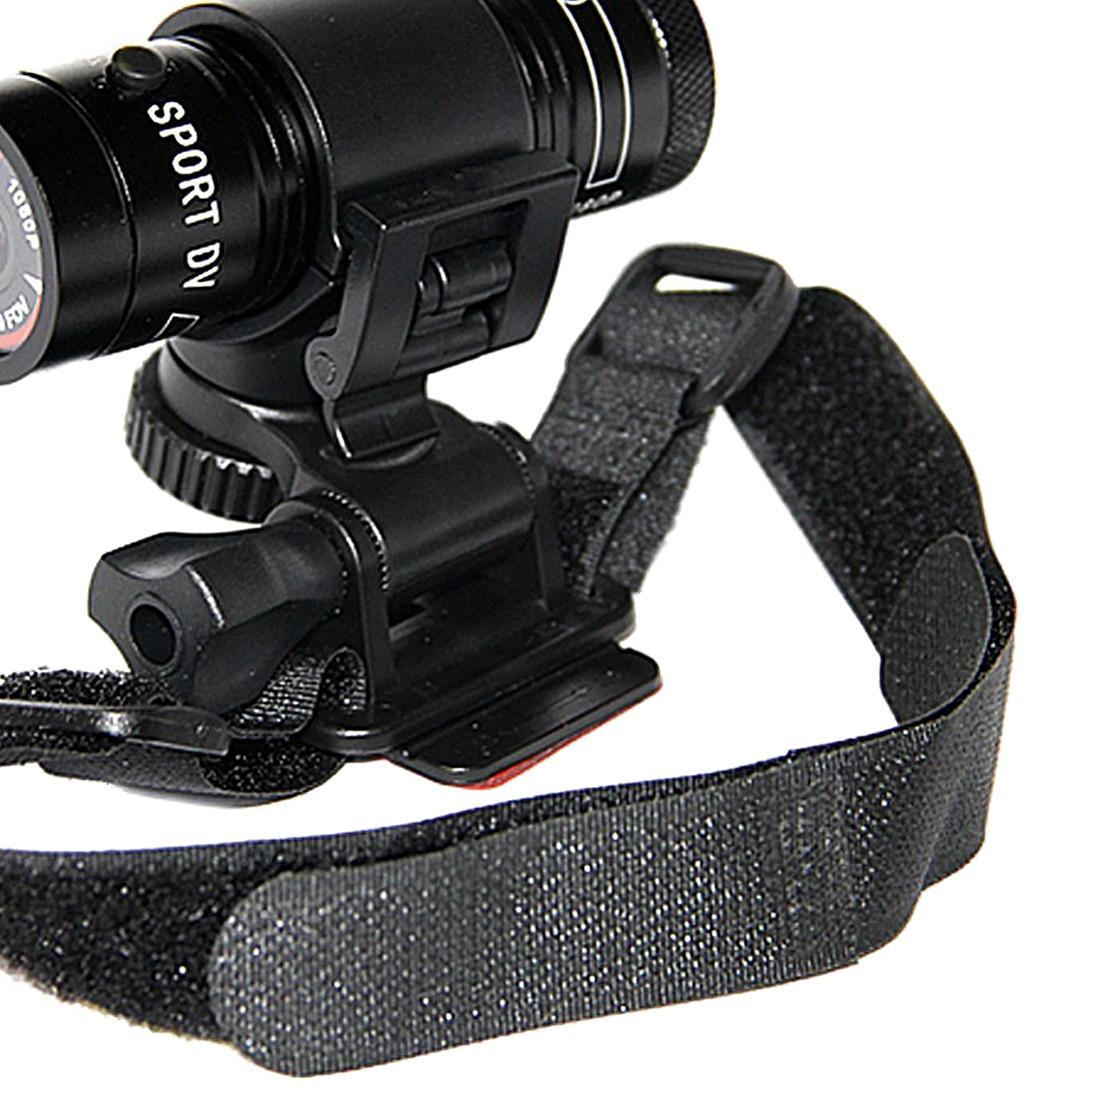 5 Packs Sport Camera Full HD 1080P Action Waterproof Video Recorder Helmet Bike DVR wimius 4k action cam wifi 20m mini sport helmet fpv camera full hd 1080p go waterproof underwater 30m pro dvr for bike motorcyle